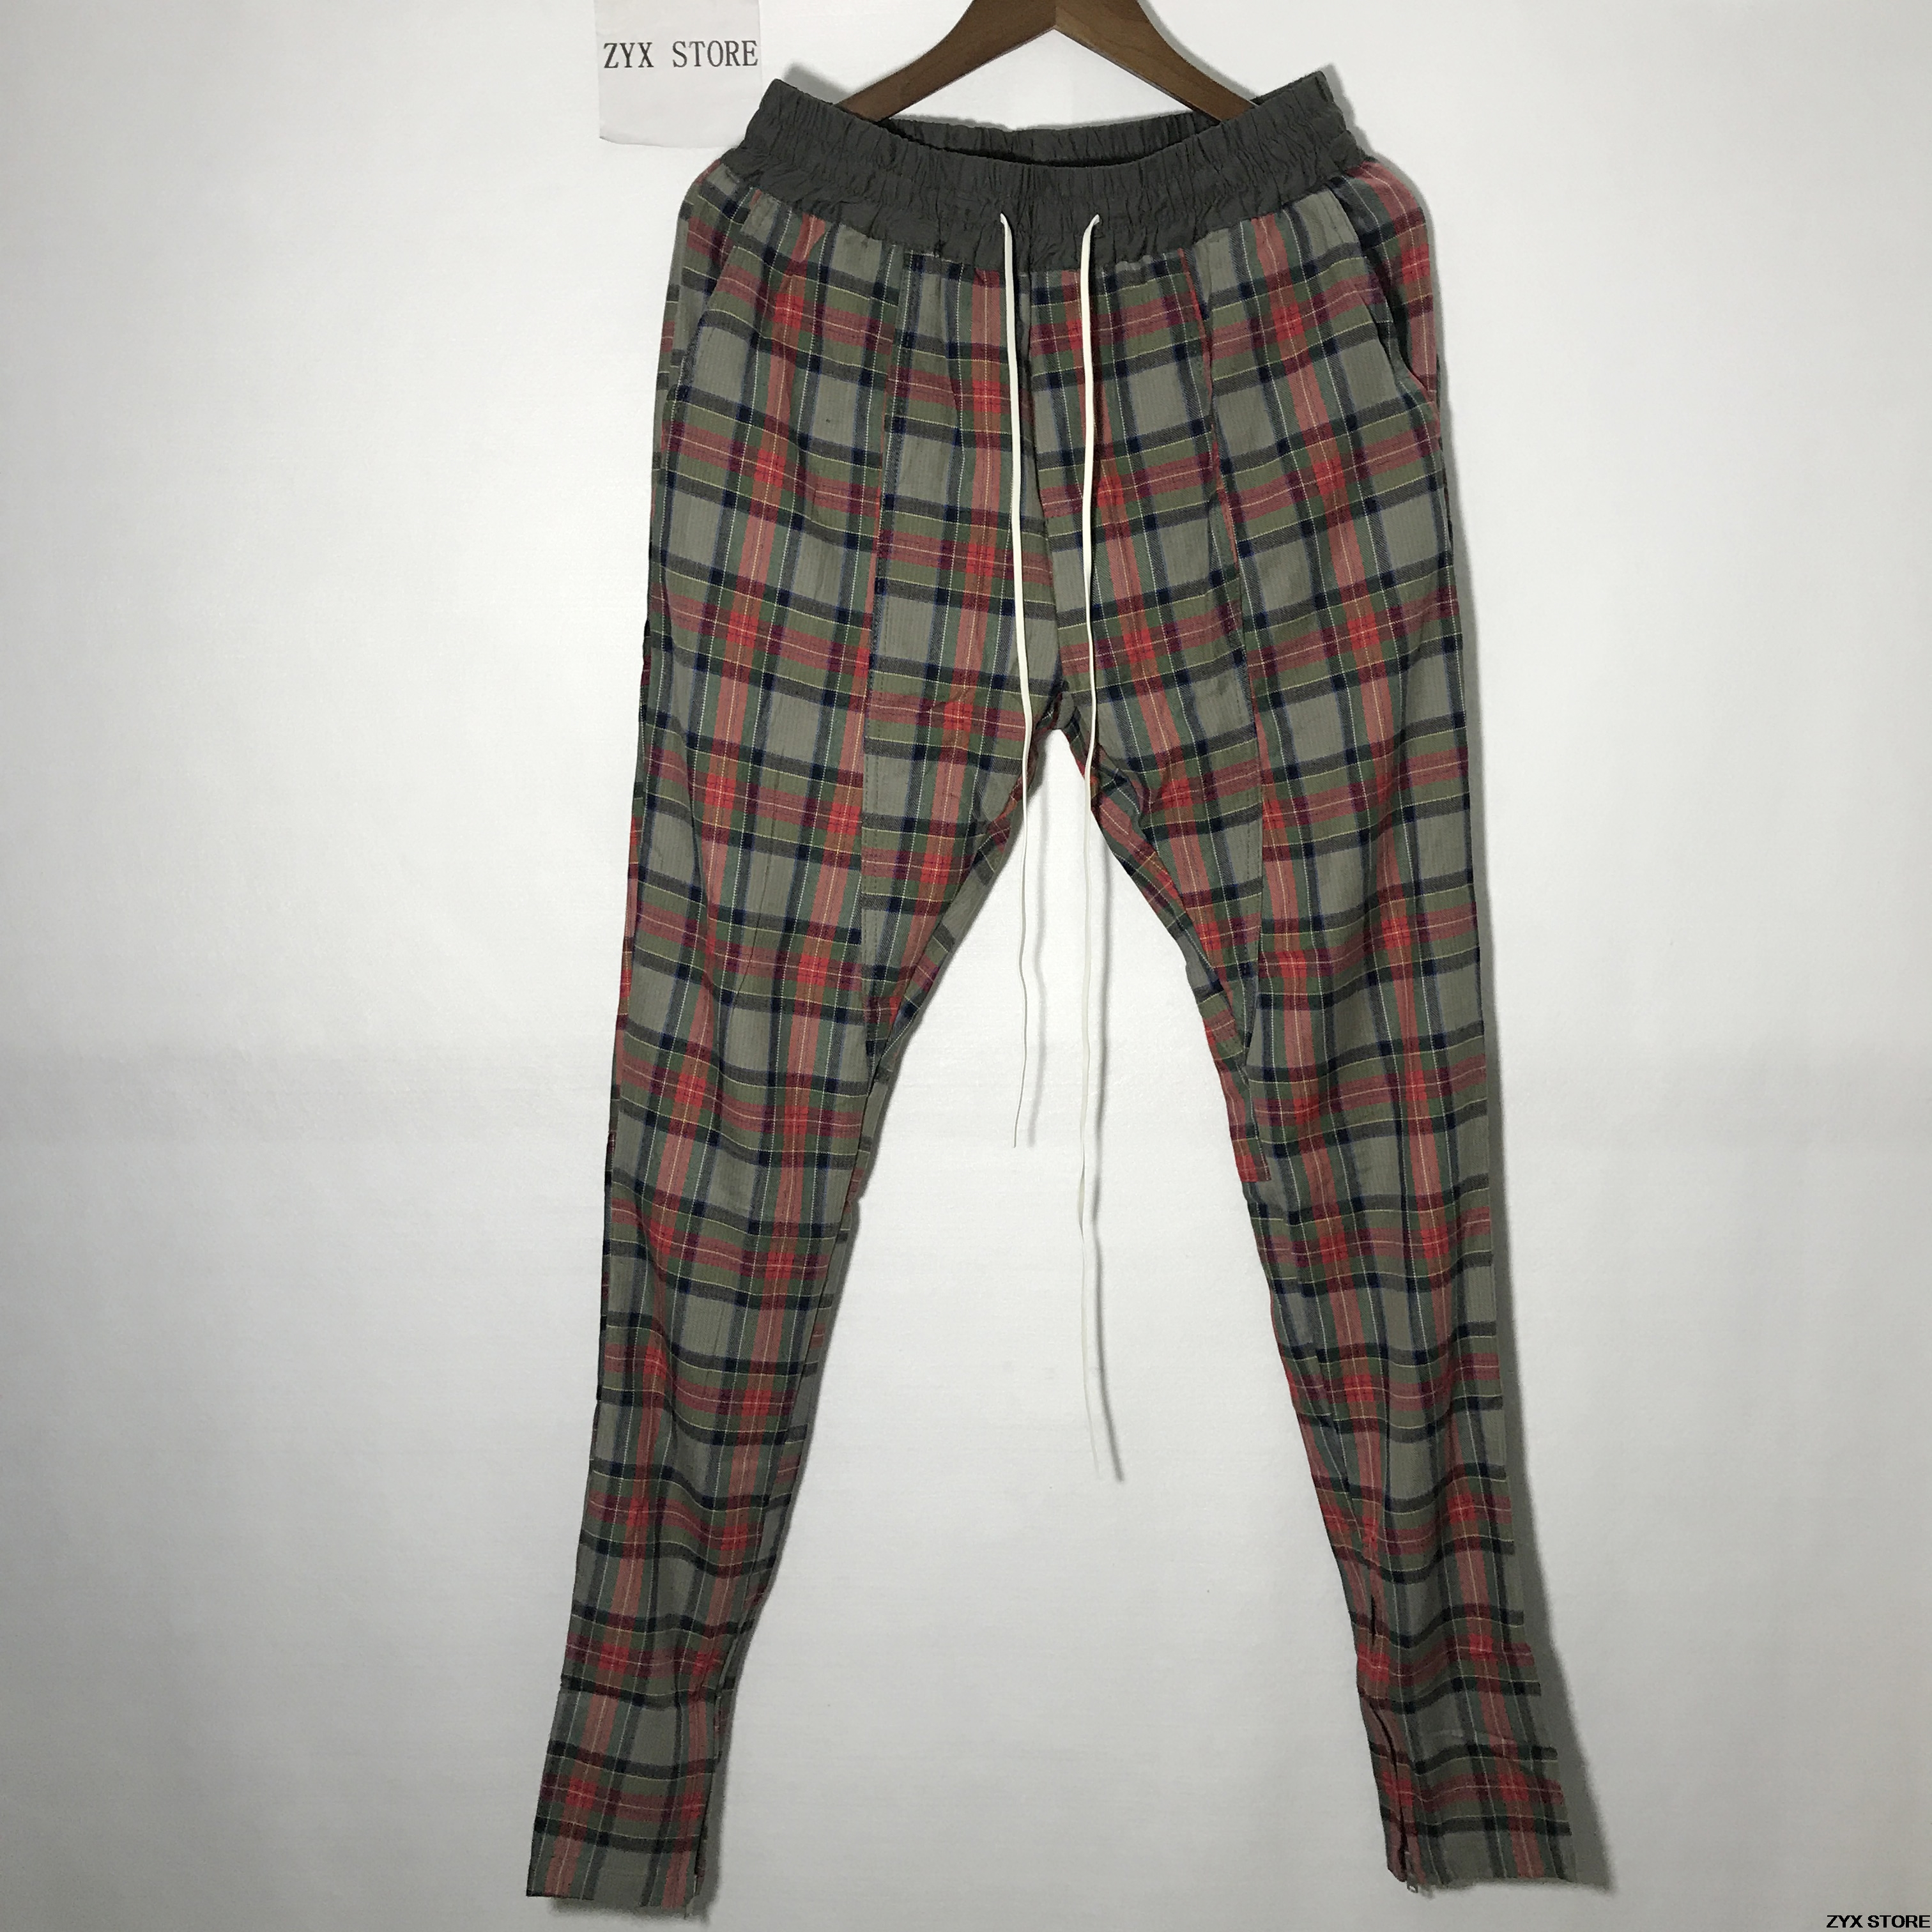 Best Version Fear Of God Fifth Collection New Plaid Pants Hiphop Justin Bieber Scotch Lattice Side Zip Men FOG Pants Trousers